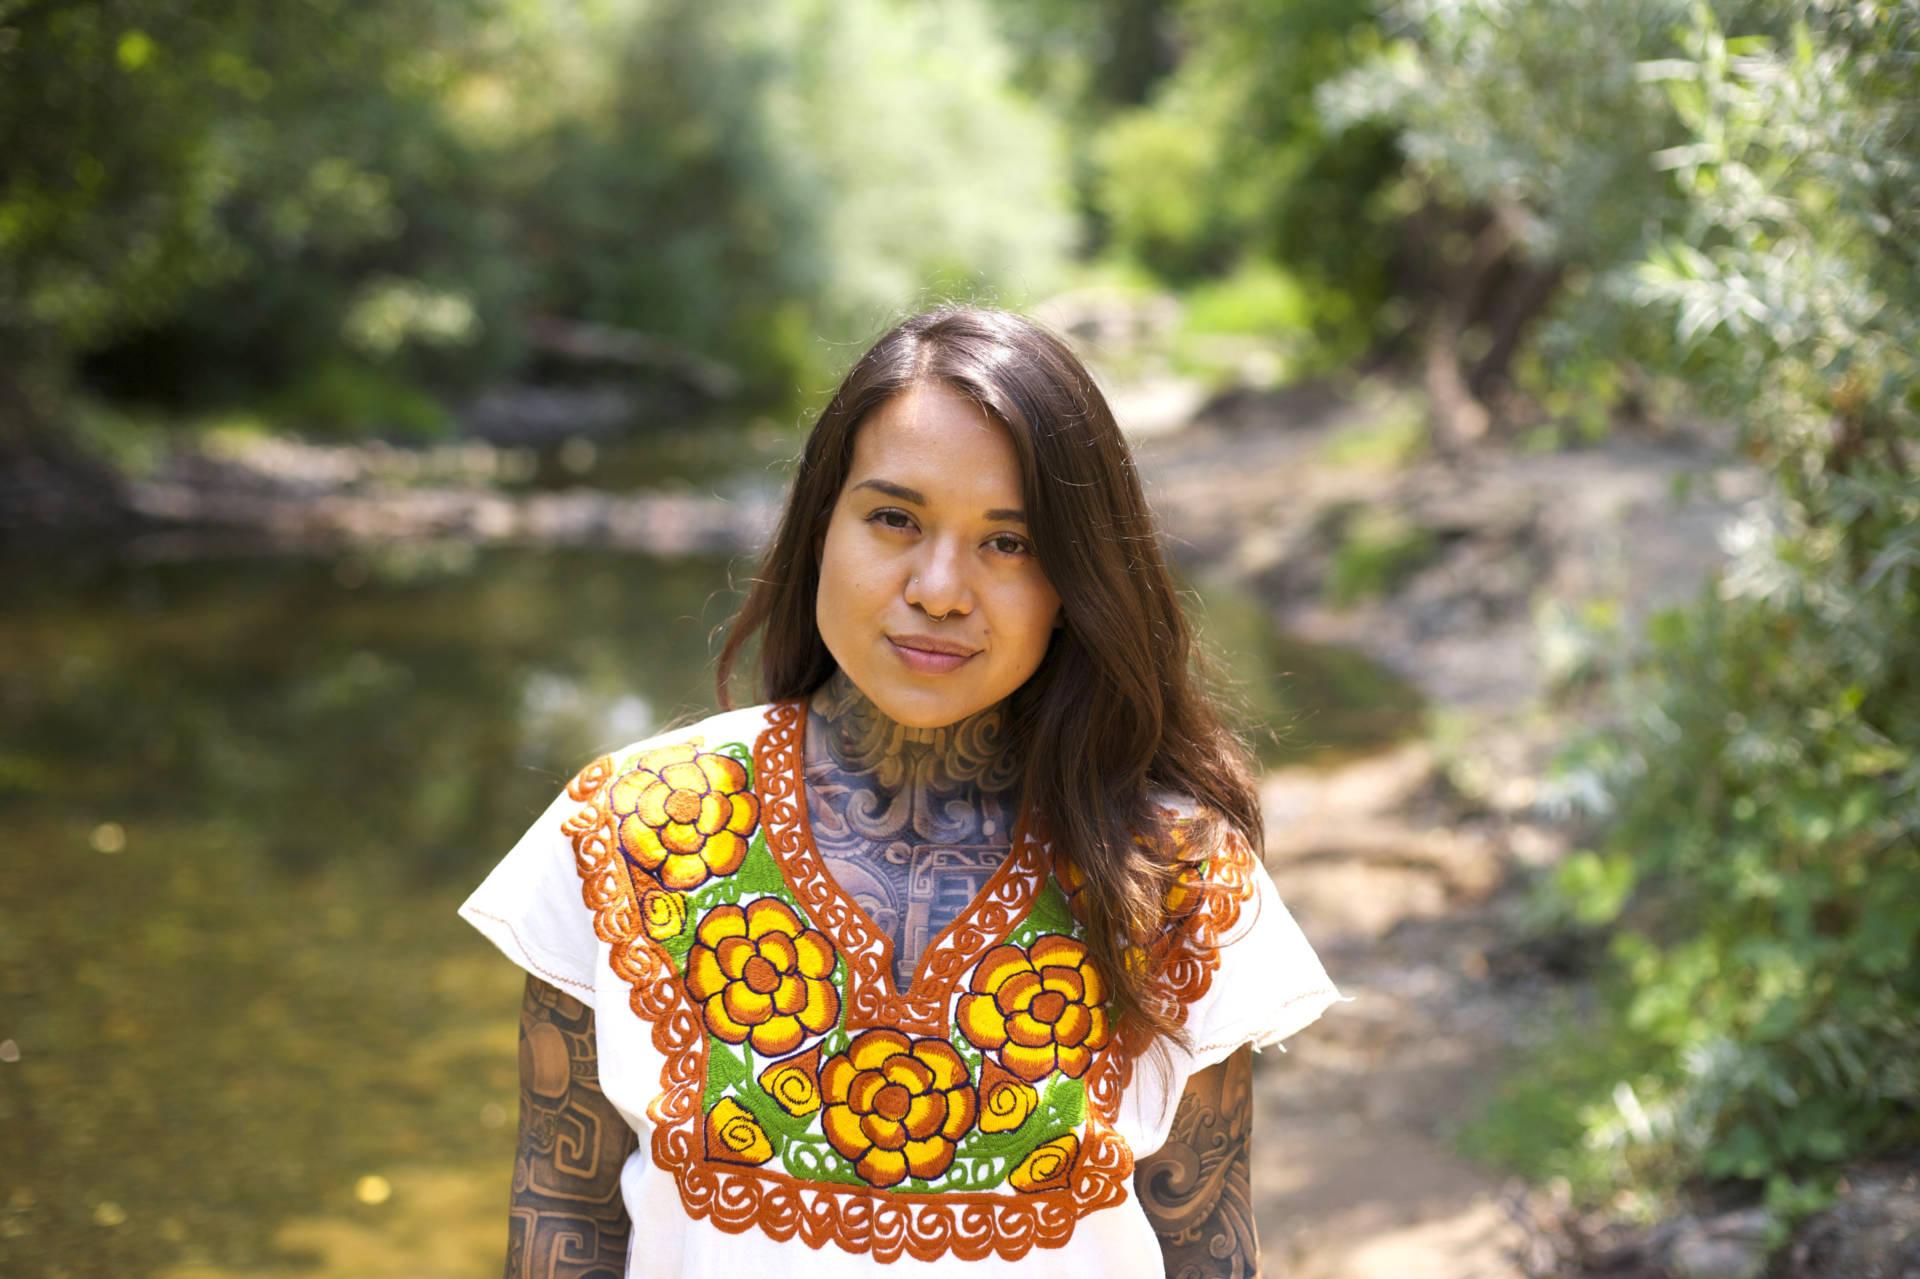 Arleene Correa Valencia stands by the creek on the Silverado Trail in Napa Valley.